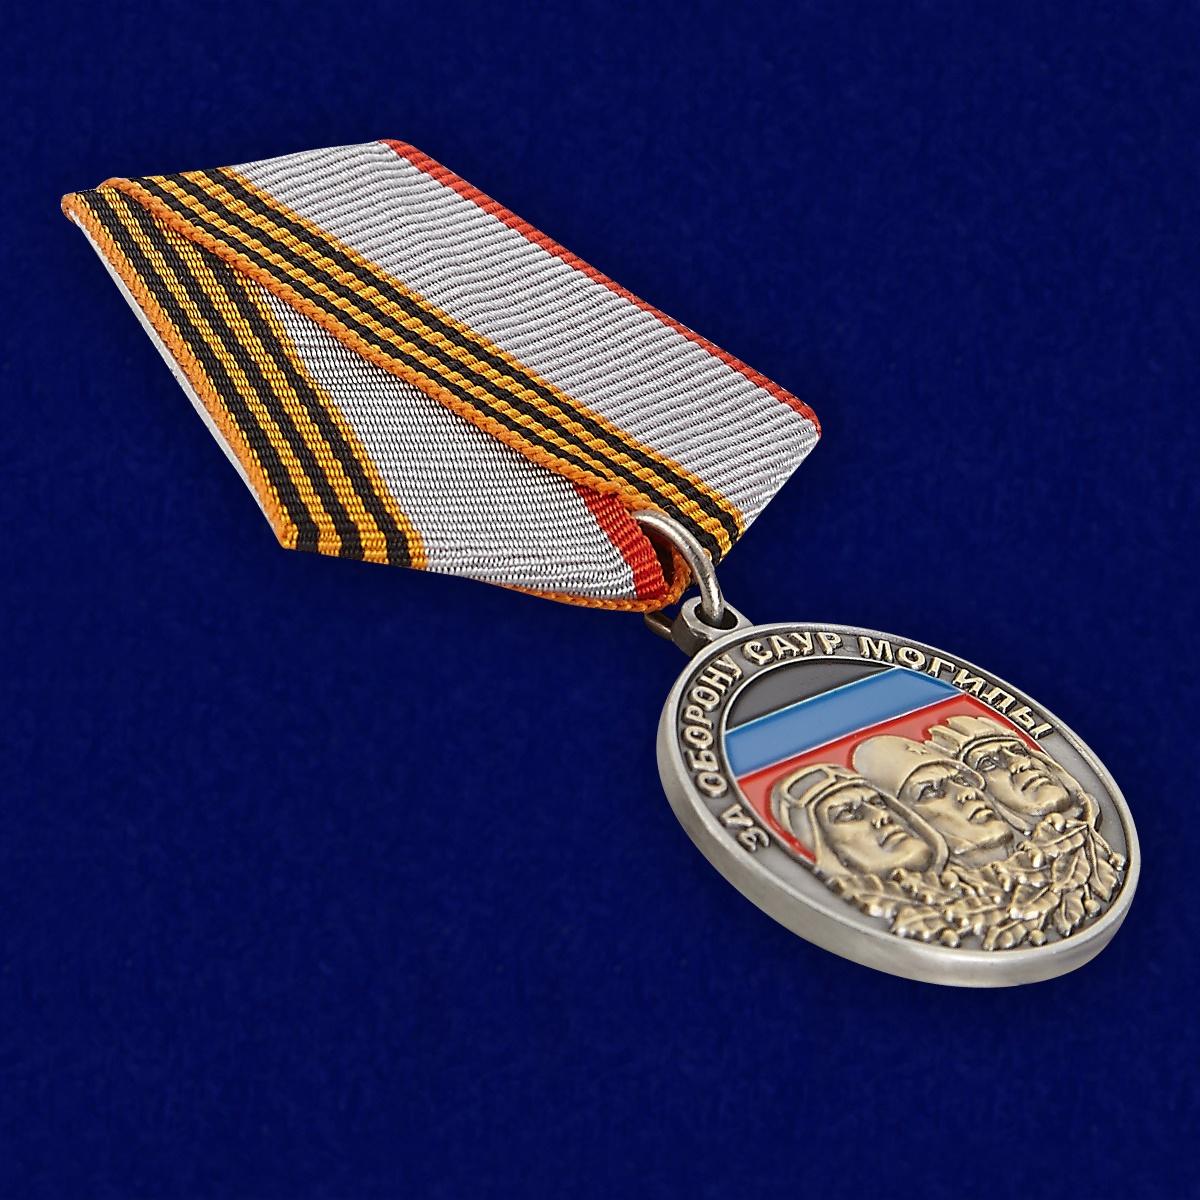 Медаль За оборону Саур-Могилы ДНР - общий вид